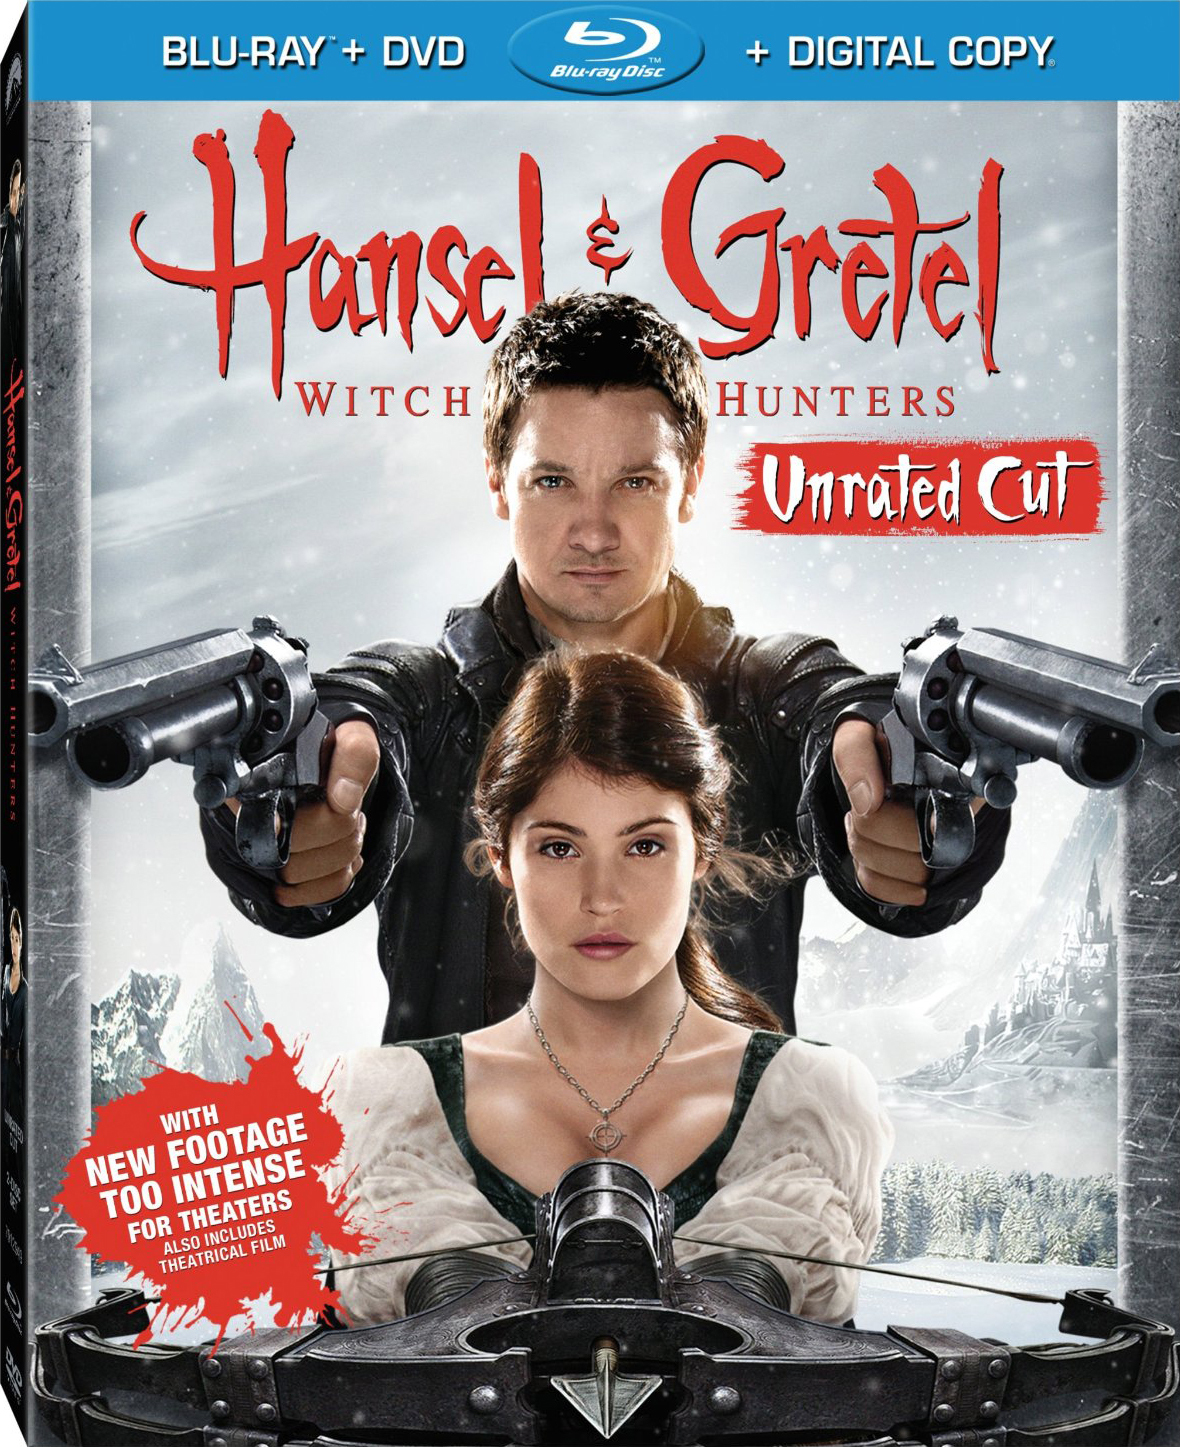 http://4.bp.blogspot.com/-J5jEBm-8iGo/UbdYwbzBfEI/AAAAAAAAWnM/_l2mXs7qD24/s1600/hansel-gretel-witch-hunters-3d-blu-ray-dvd-cover.jpg